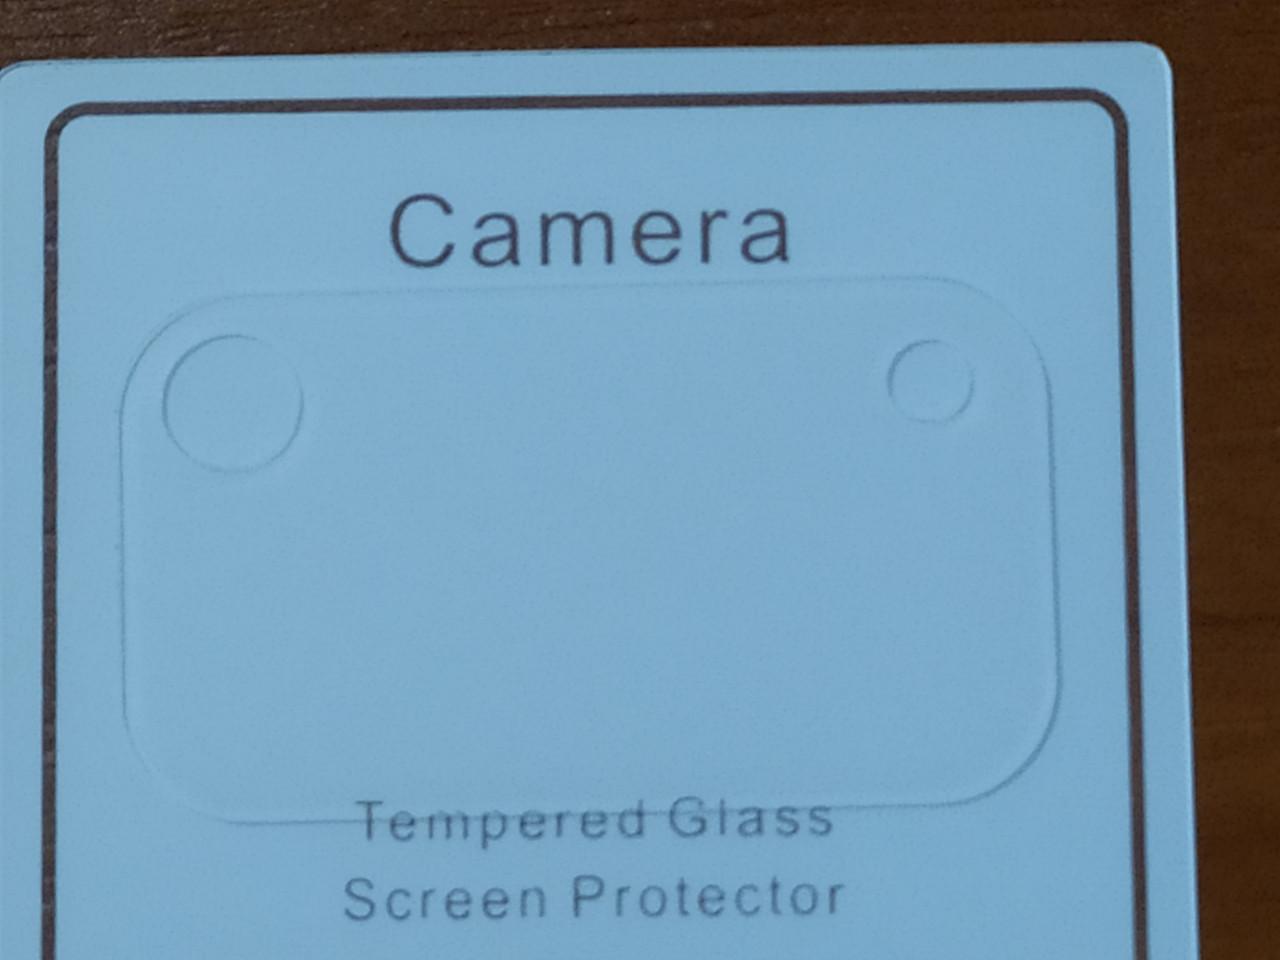 Захисне скло на камеру Tempered Glass Screen Protector для Samsung S20 Plus